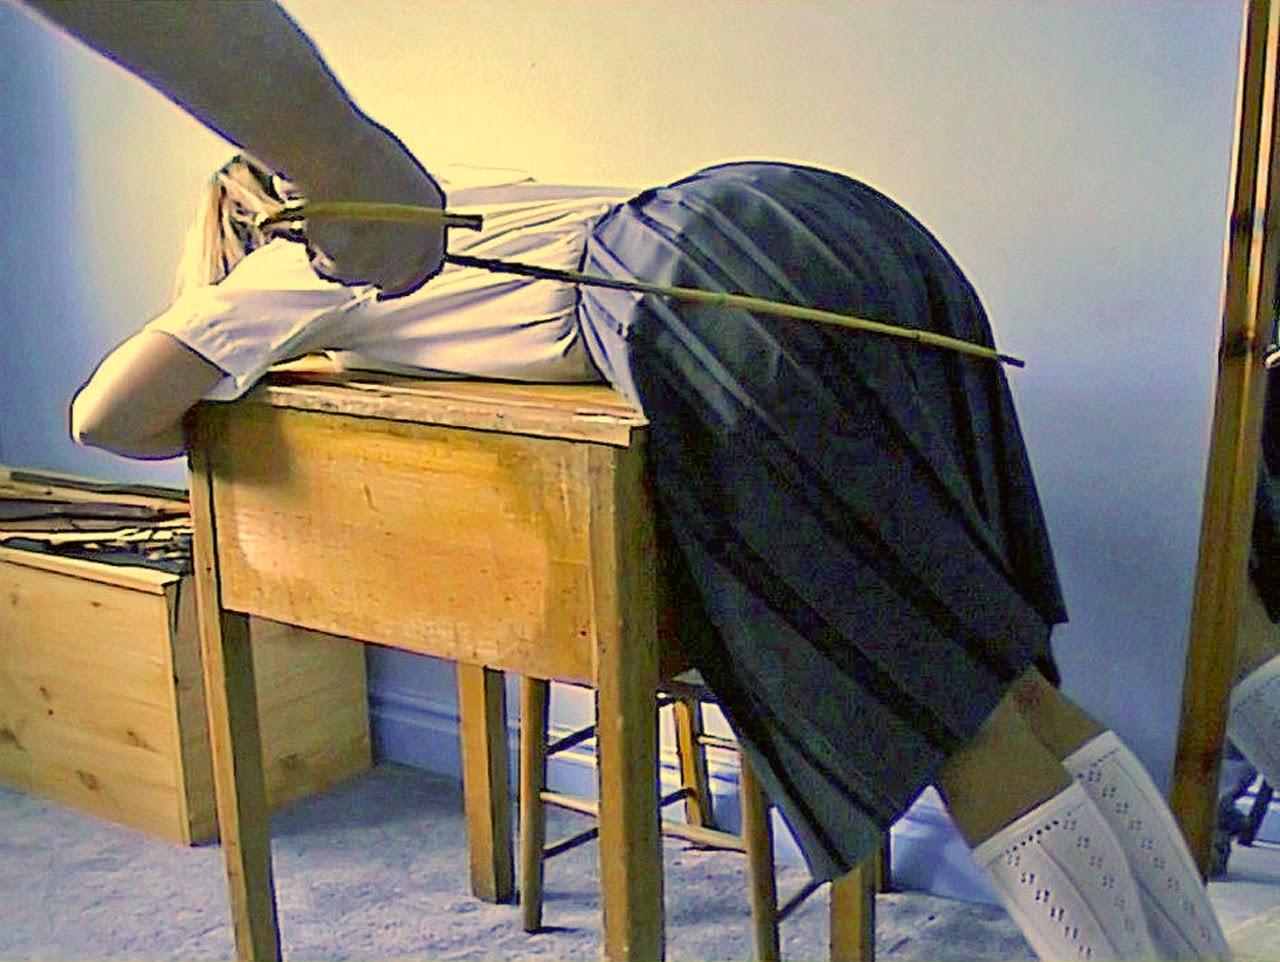 school caning tube